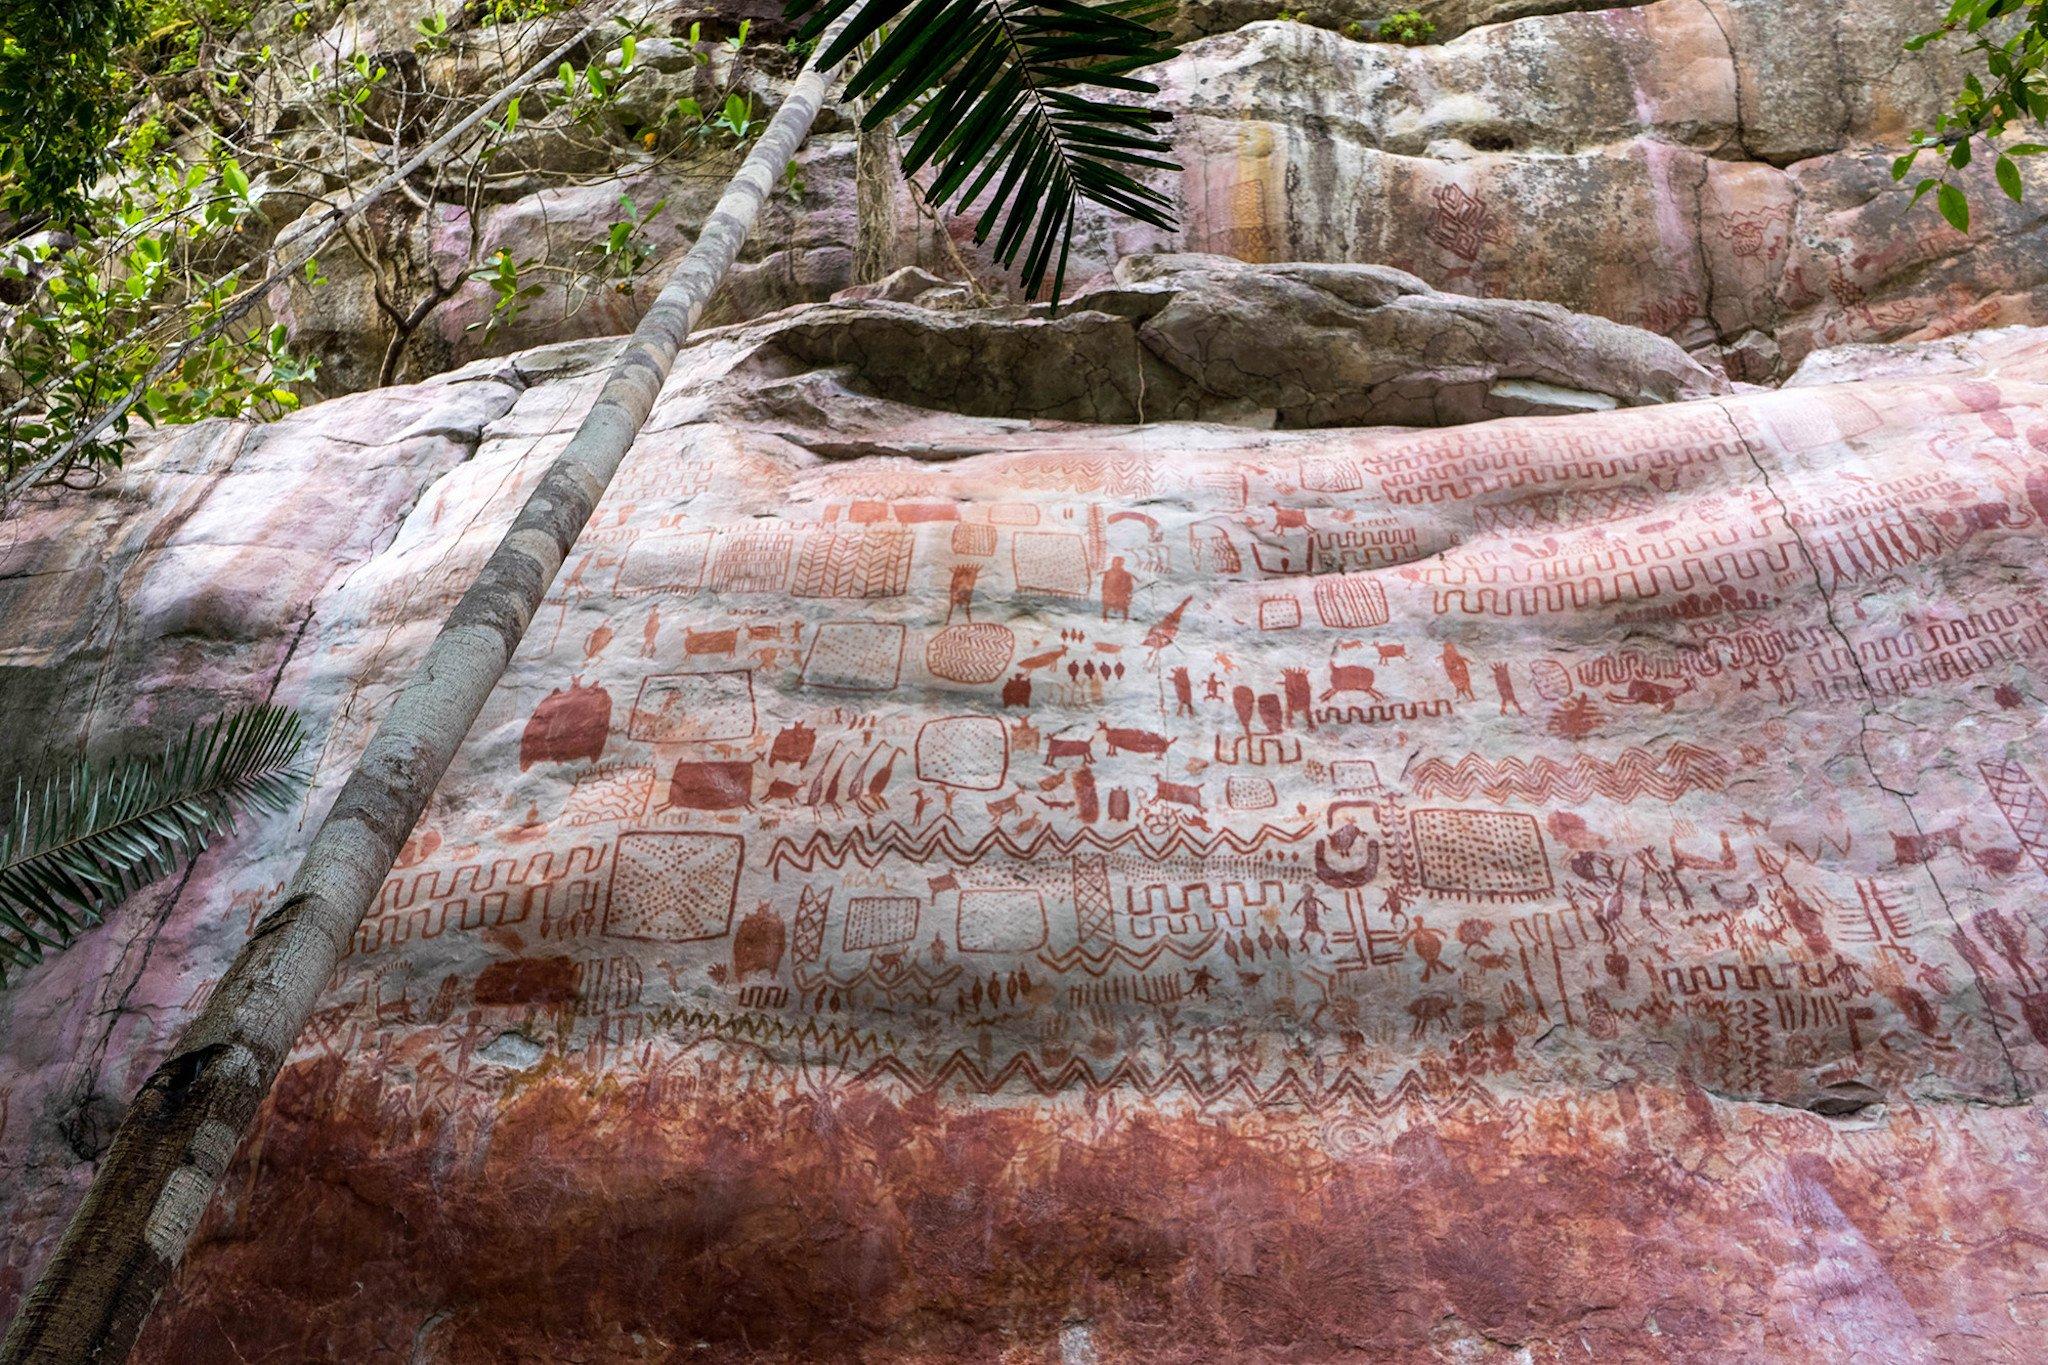 Temukan puluhan ribu lukisan batu di Amazon yang berusia 12.500 tahun